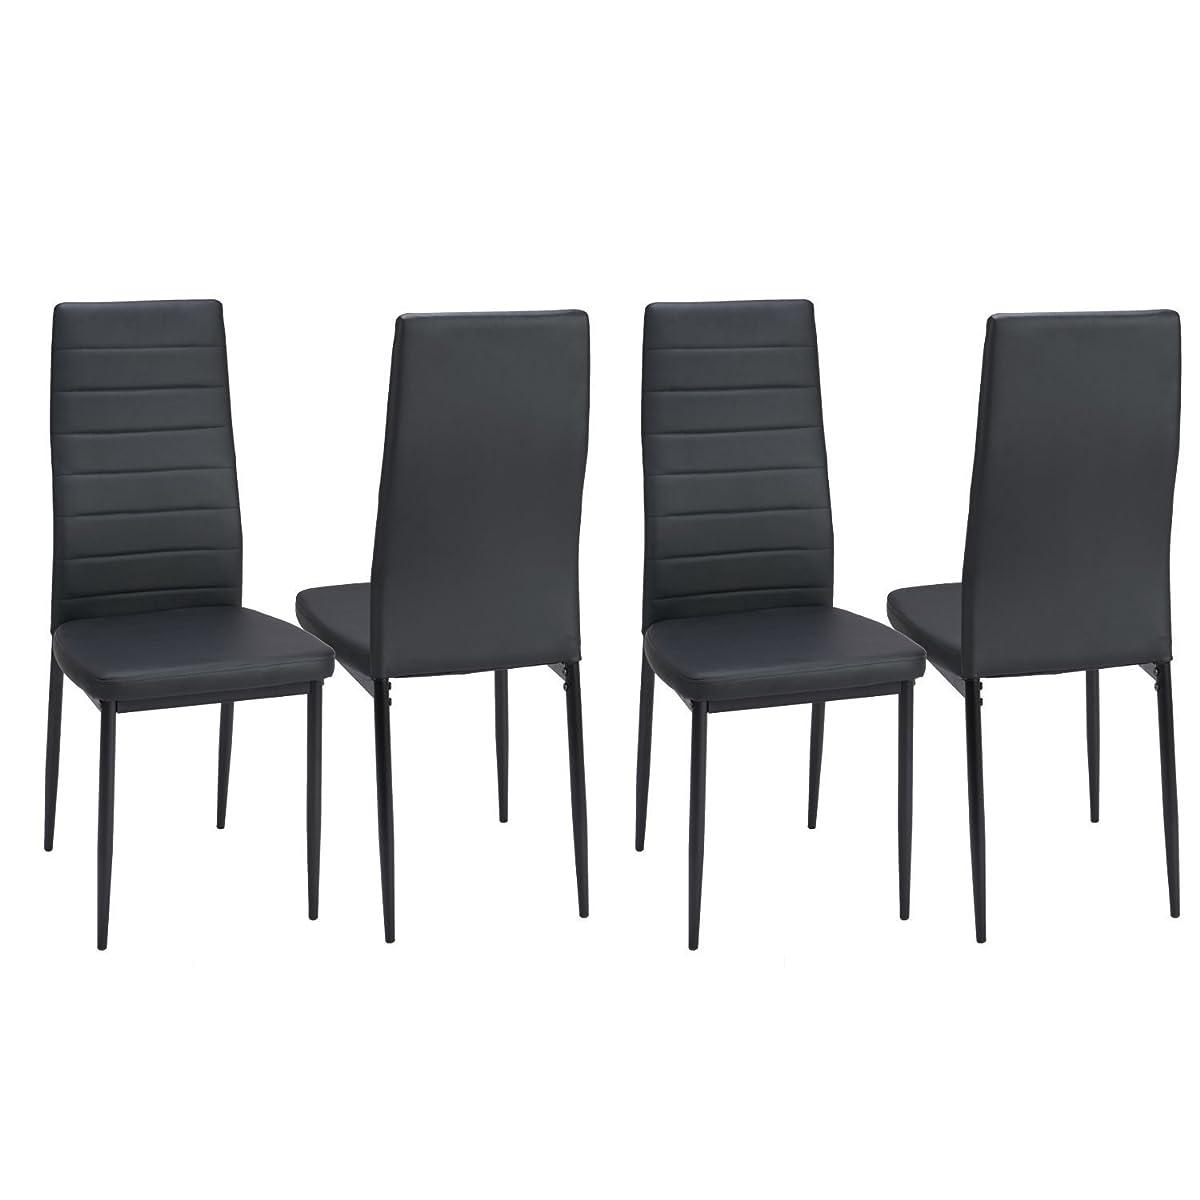 Dining Side Chairs Set of 4 PU Leather Elegant Design High Back Home Kitchen Furniture Black